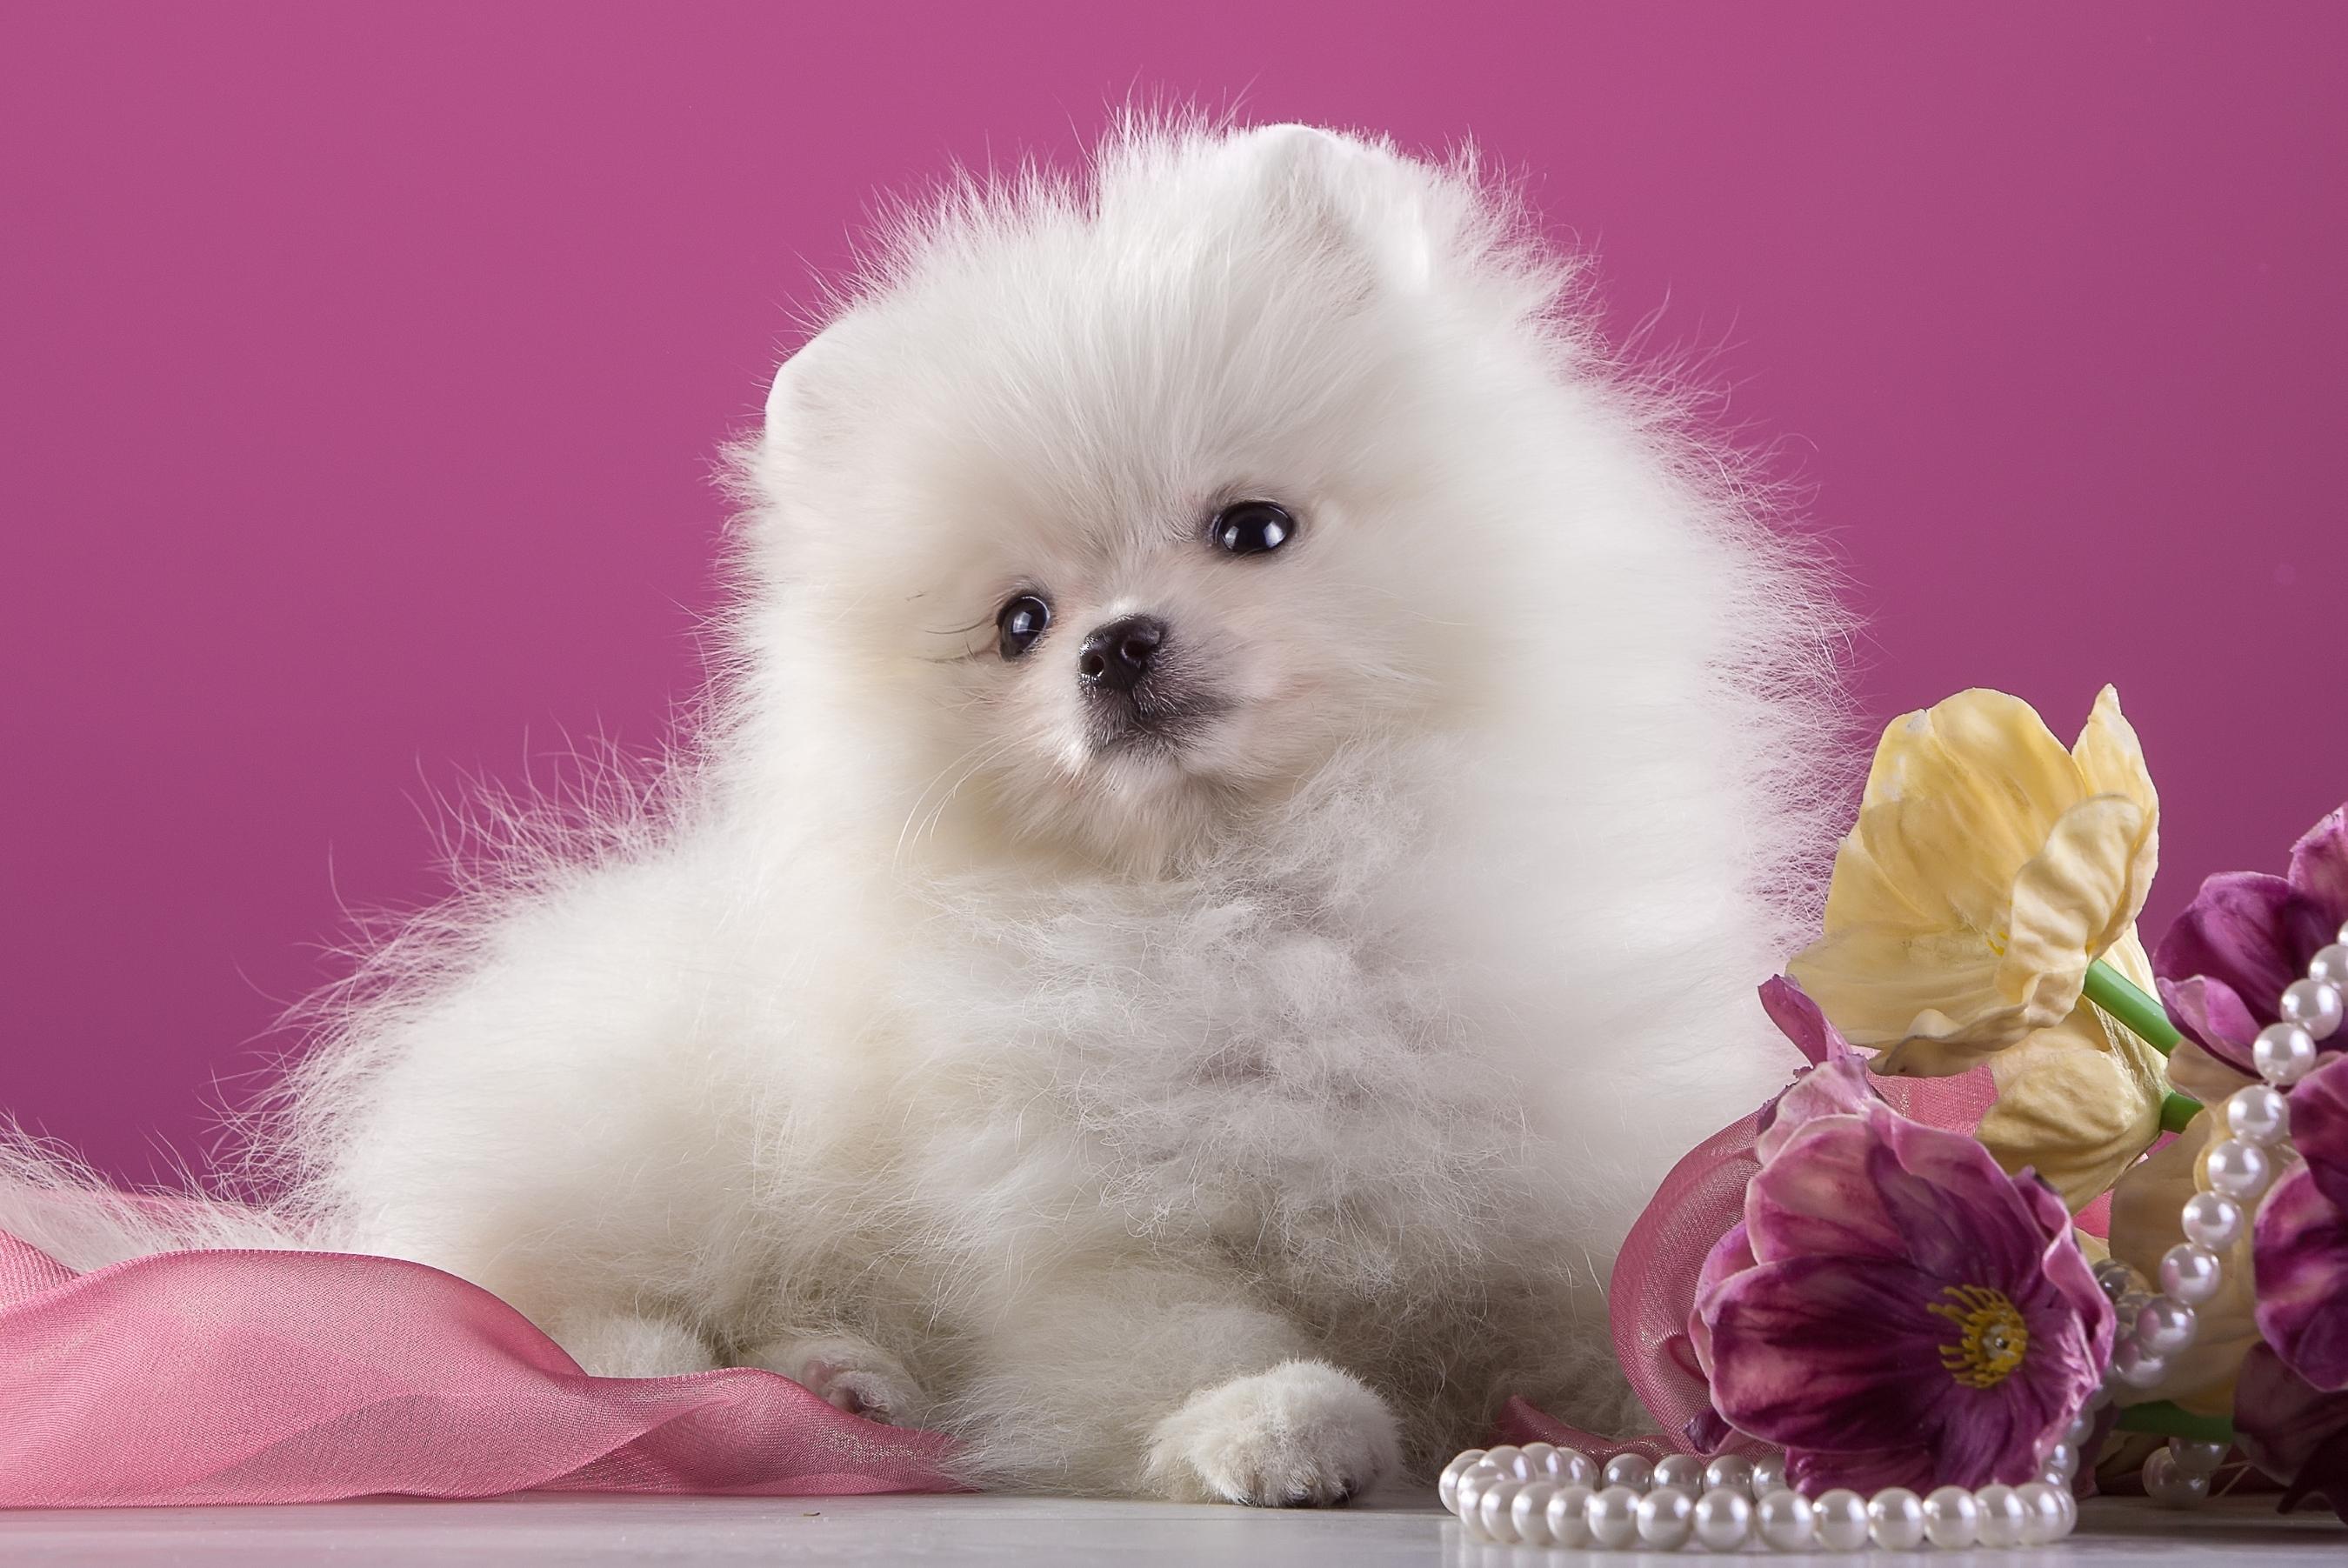 White Pomeranian Puppy Hd Wallpaper Background Image 2700x1803 Id 738239 Wallpaper Abyss